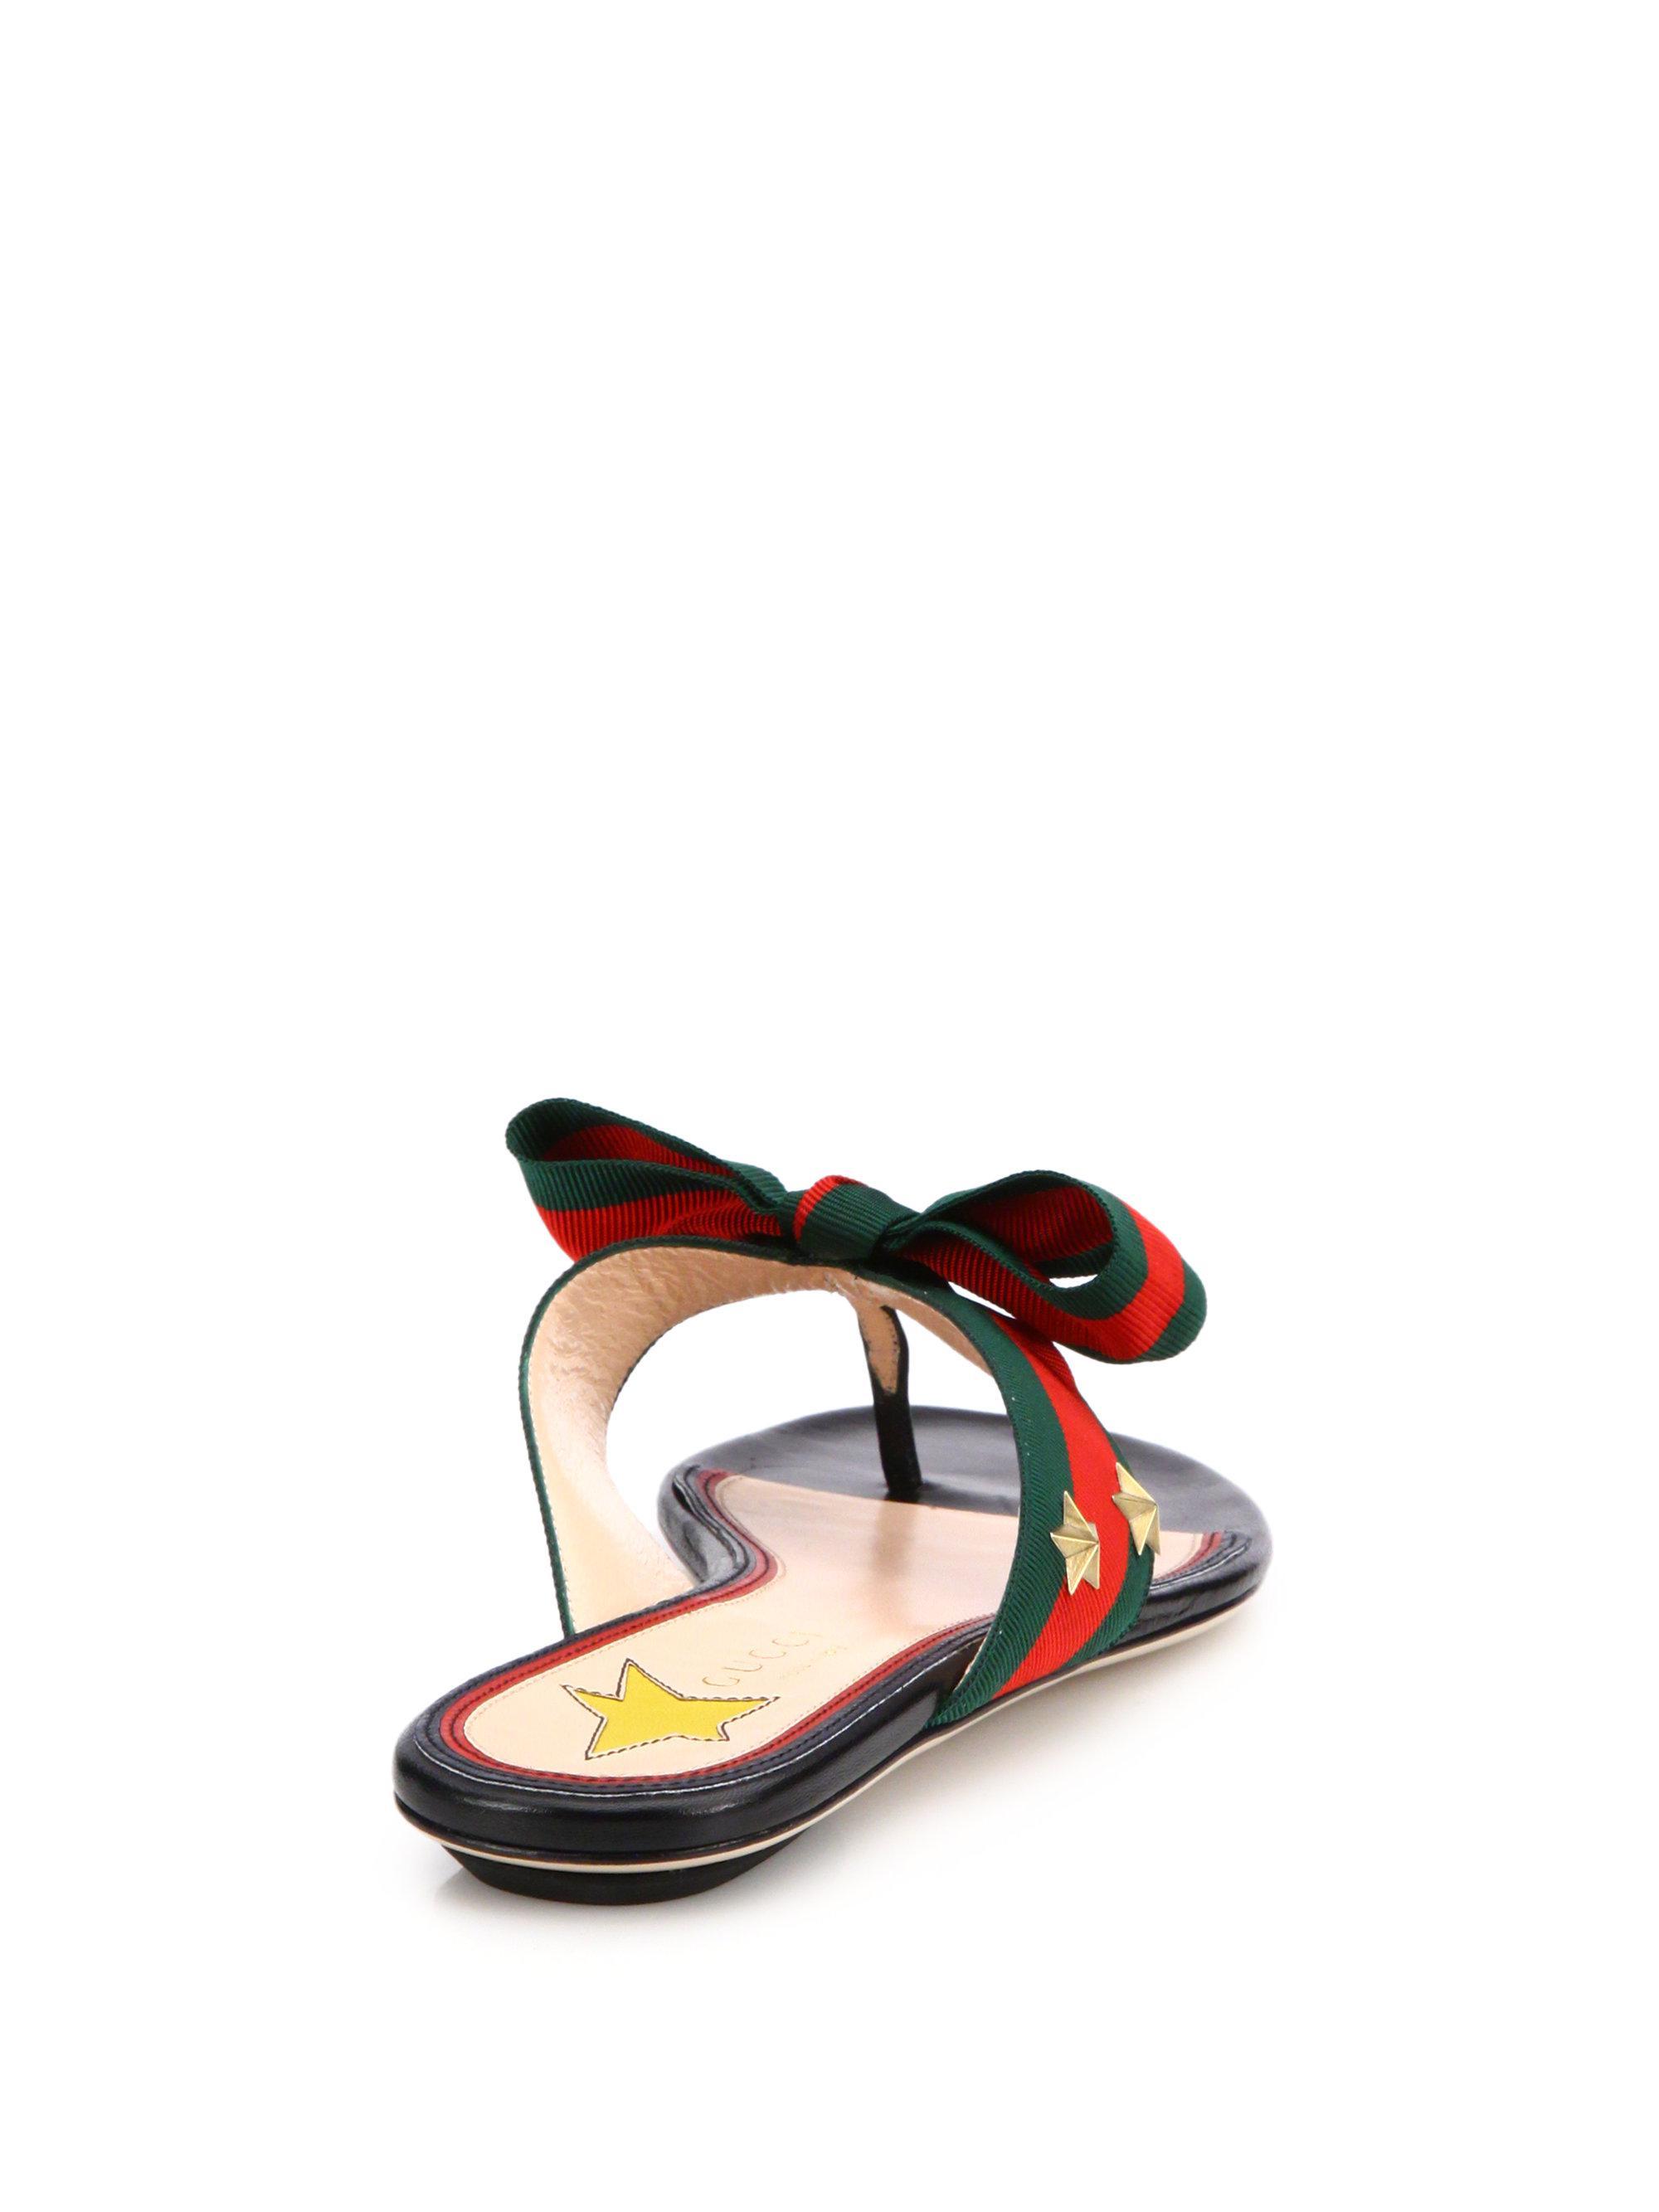 8943d0fb040 Lyst - Gucci Aline Grosgrain Web Thong Sandals in Black